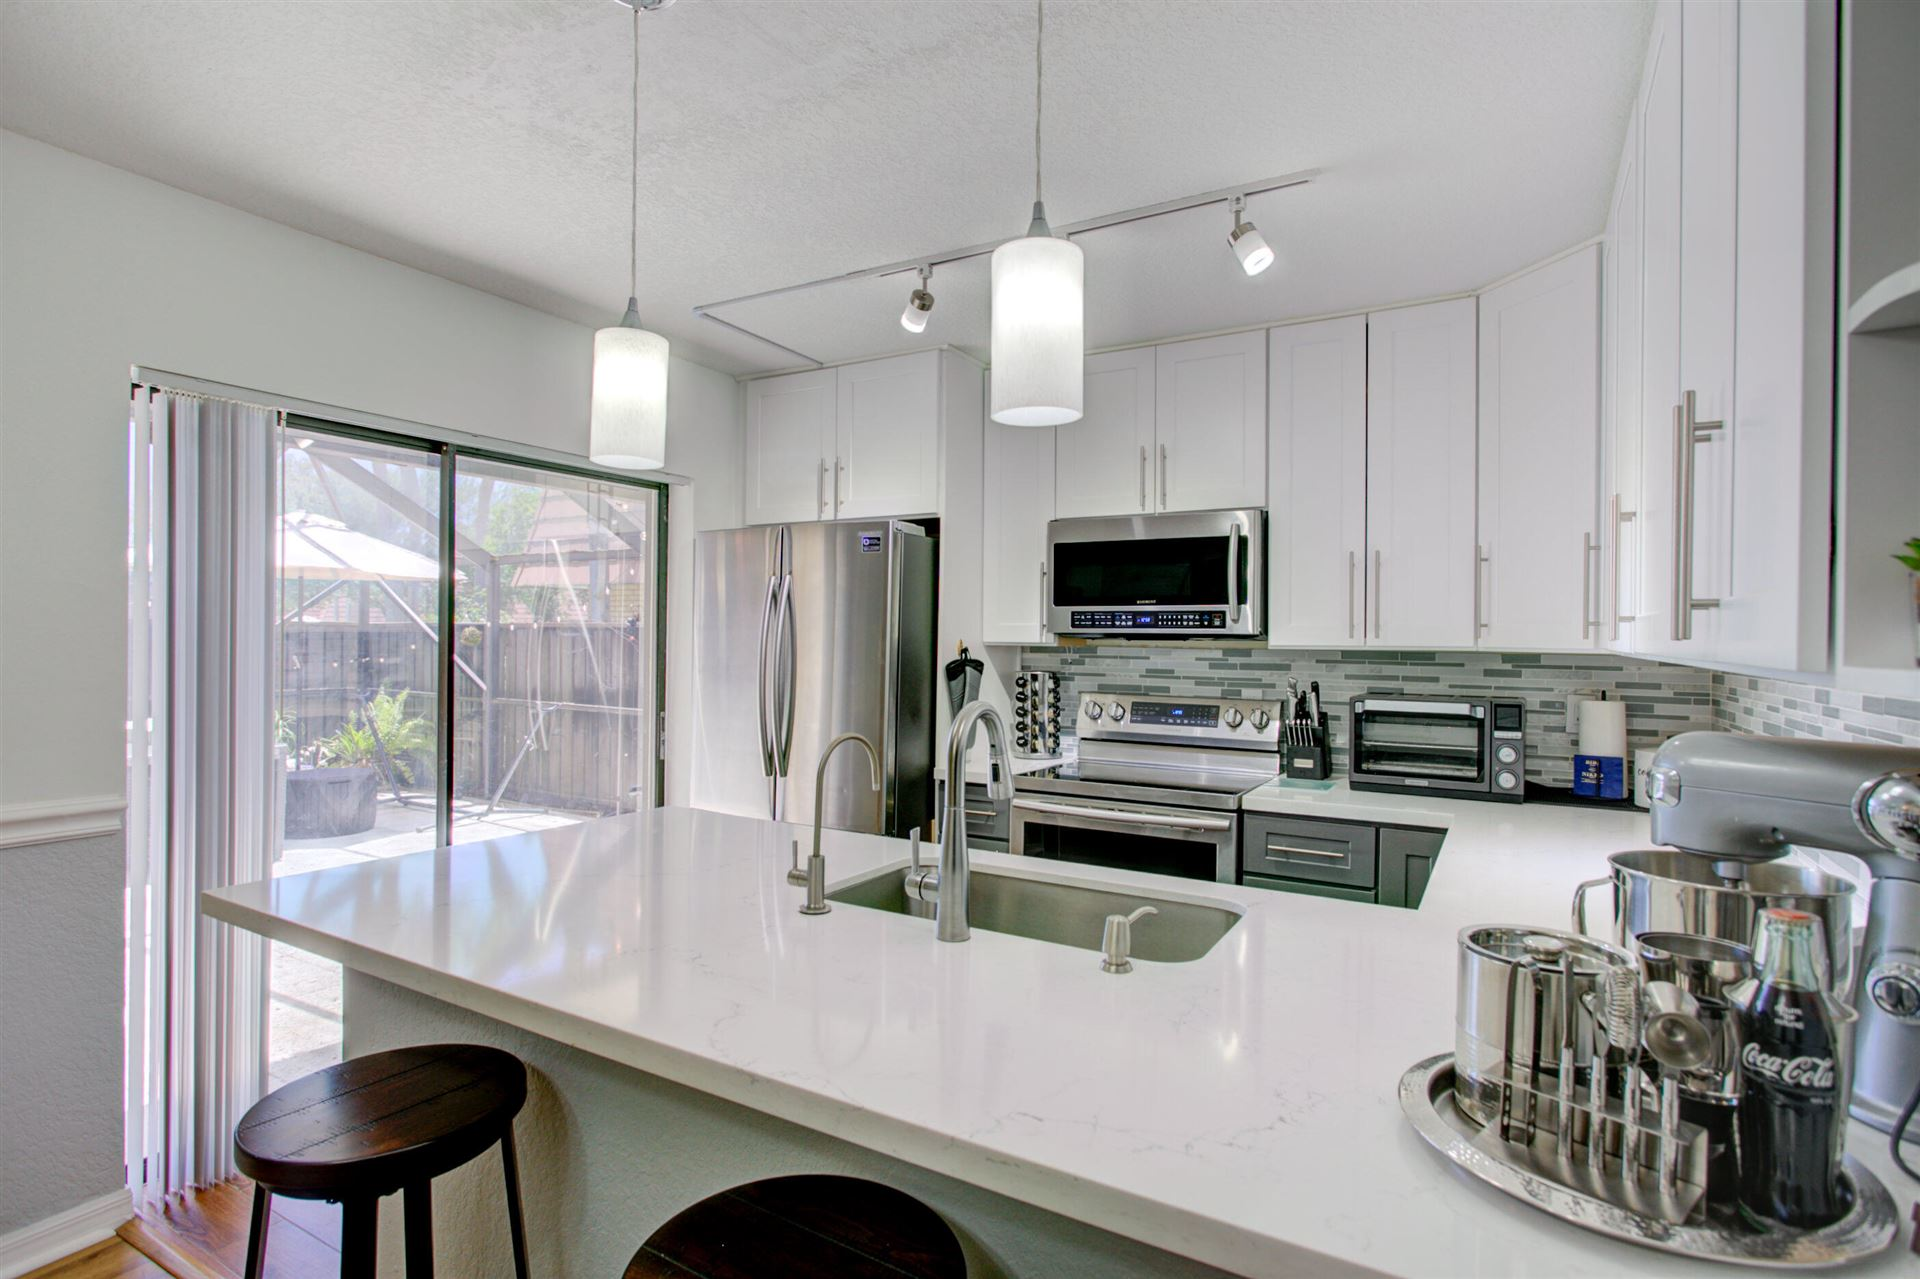 503 Buttonwood Lane, Boynton Beach, FL 33436 - MLS#: RX-10717950